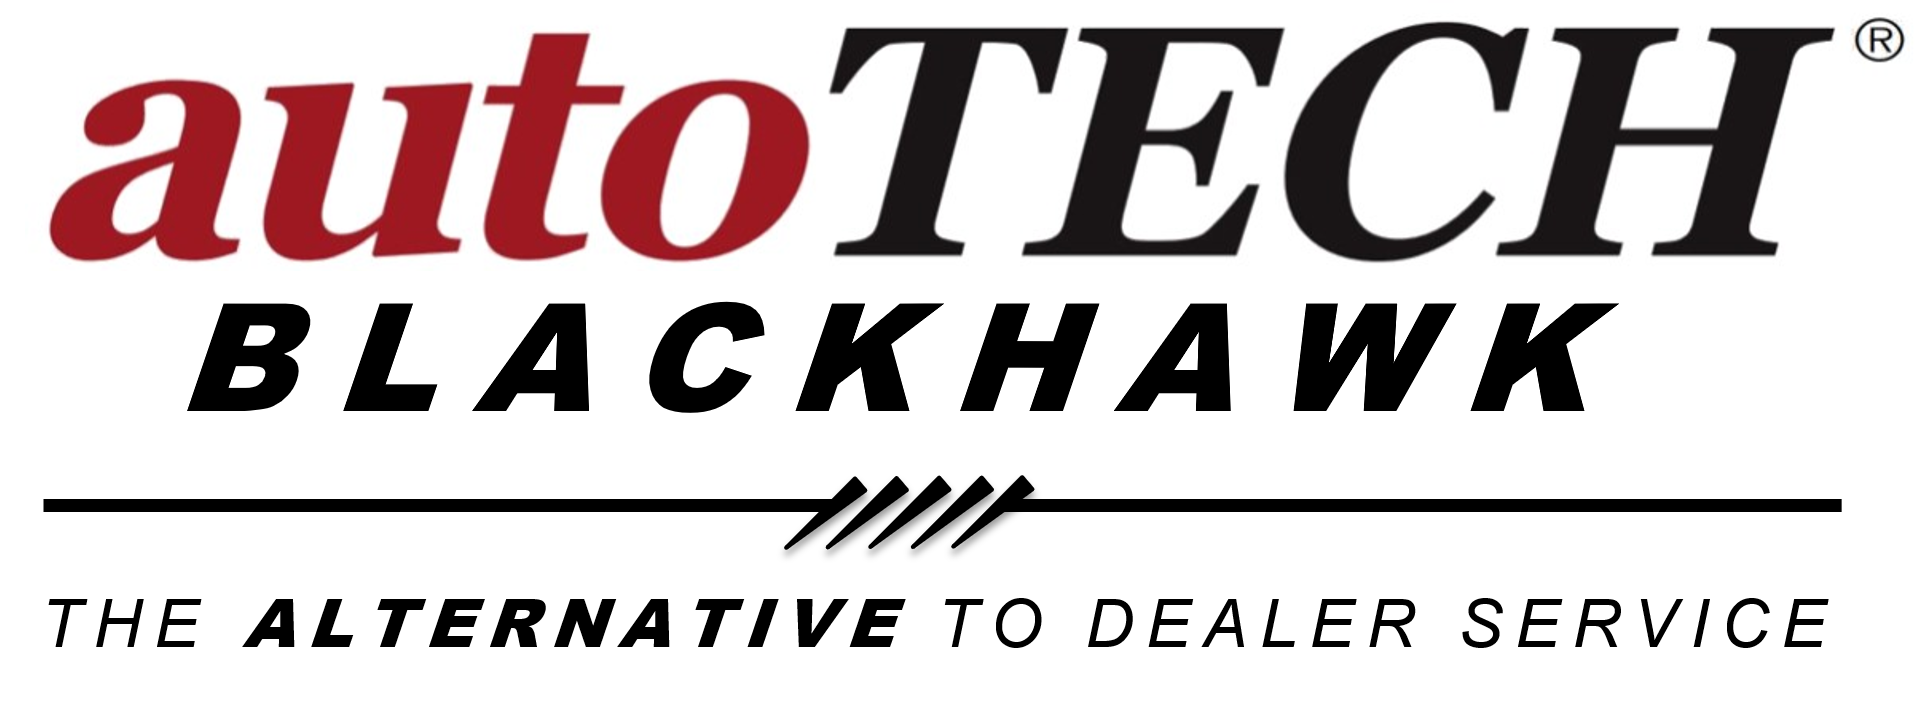 autoTECH Blackhawk, a Diamond Certified Auto Repair Shop in Danville, CA is Proud to Offer COVID Safe Auto Repairs